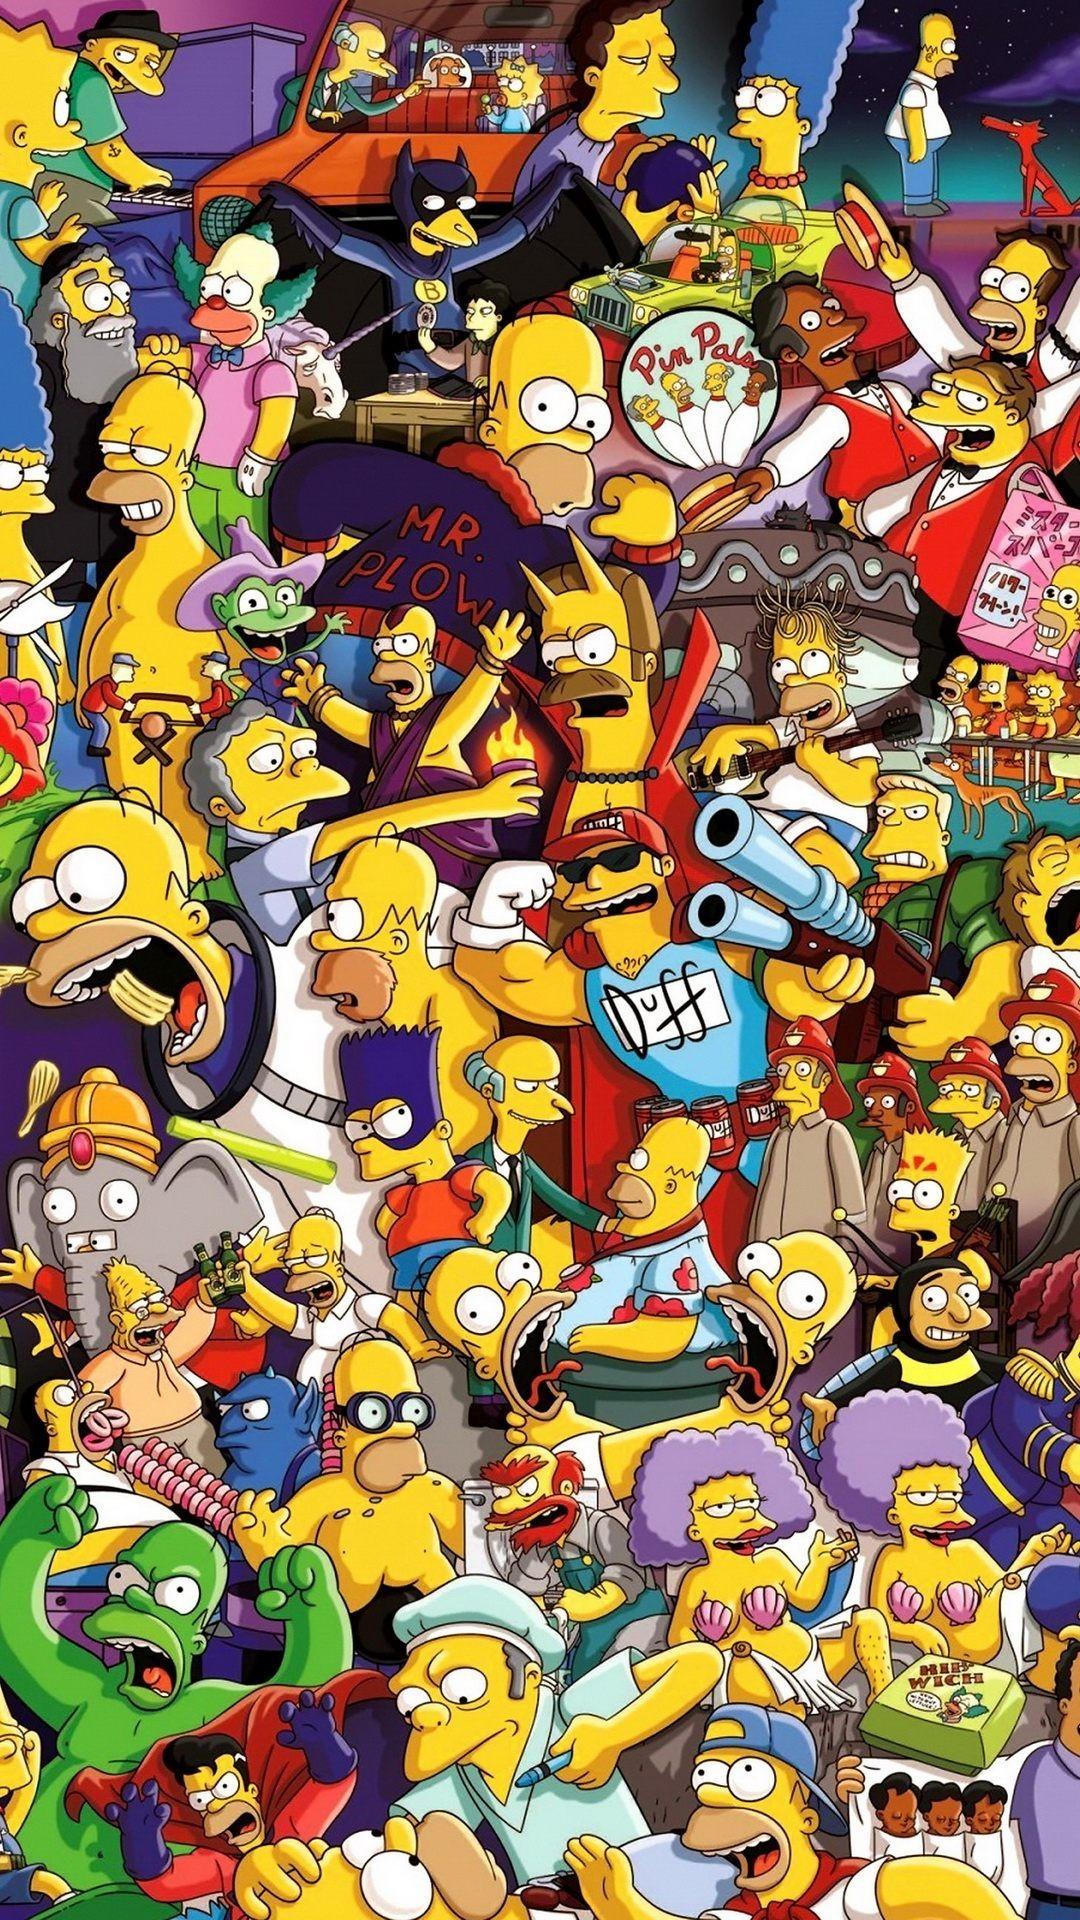 Simpsons christmas wallpaper 63 images - Cartoon character wallpaper ...